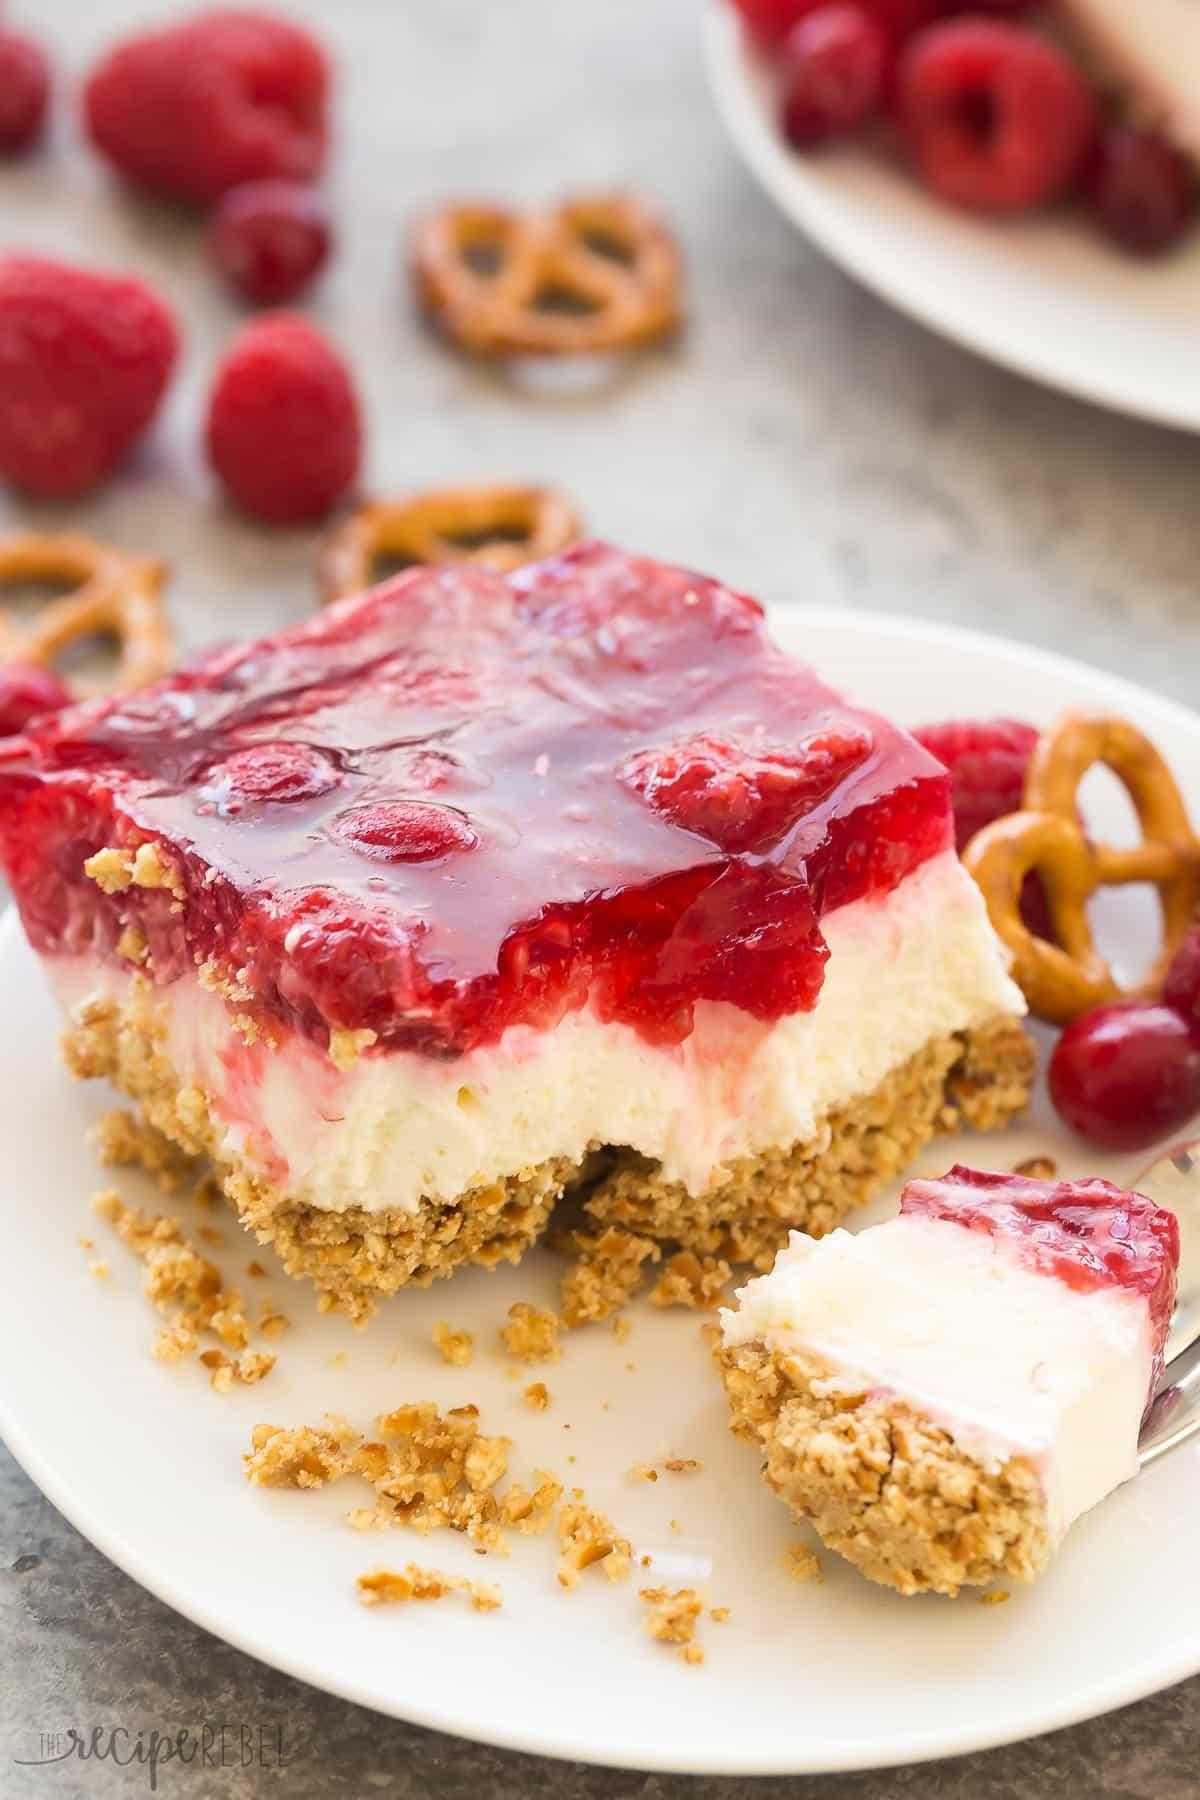 Cranberry Desserts For Thanksgiving  Cranberry Raspberry Pretzel Salad Dessert VIDEO